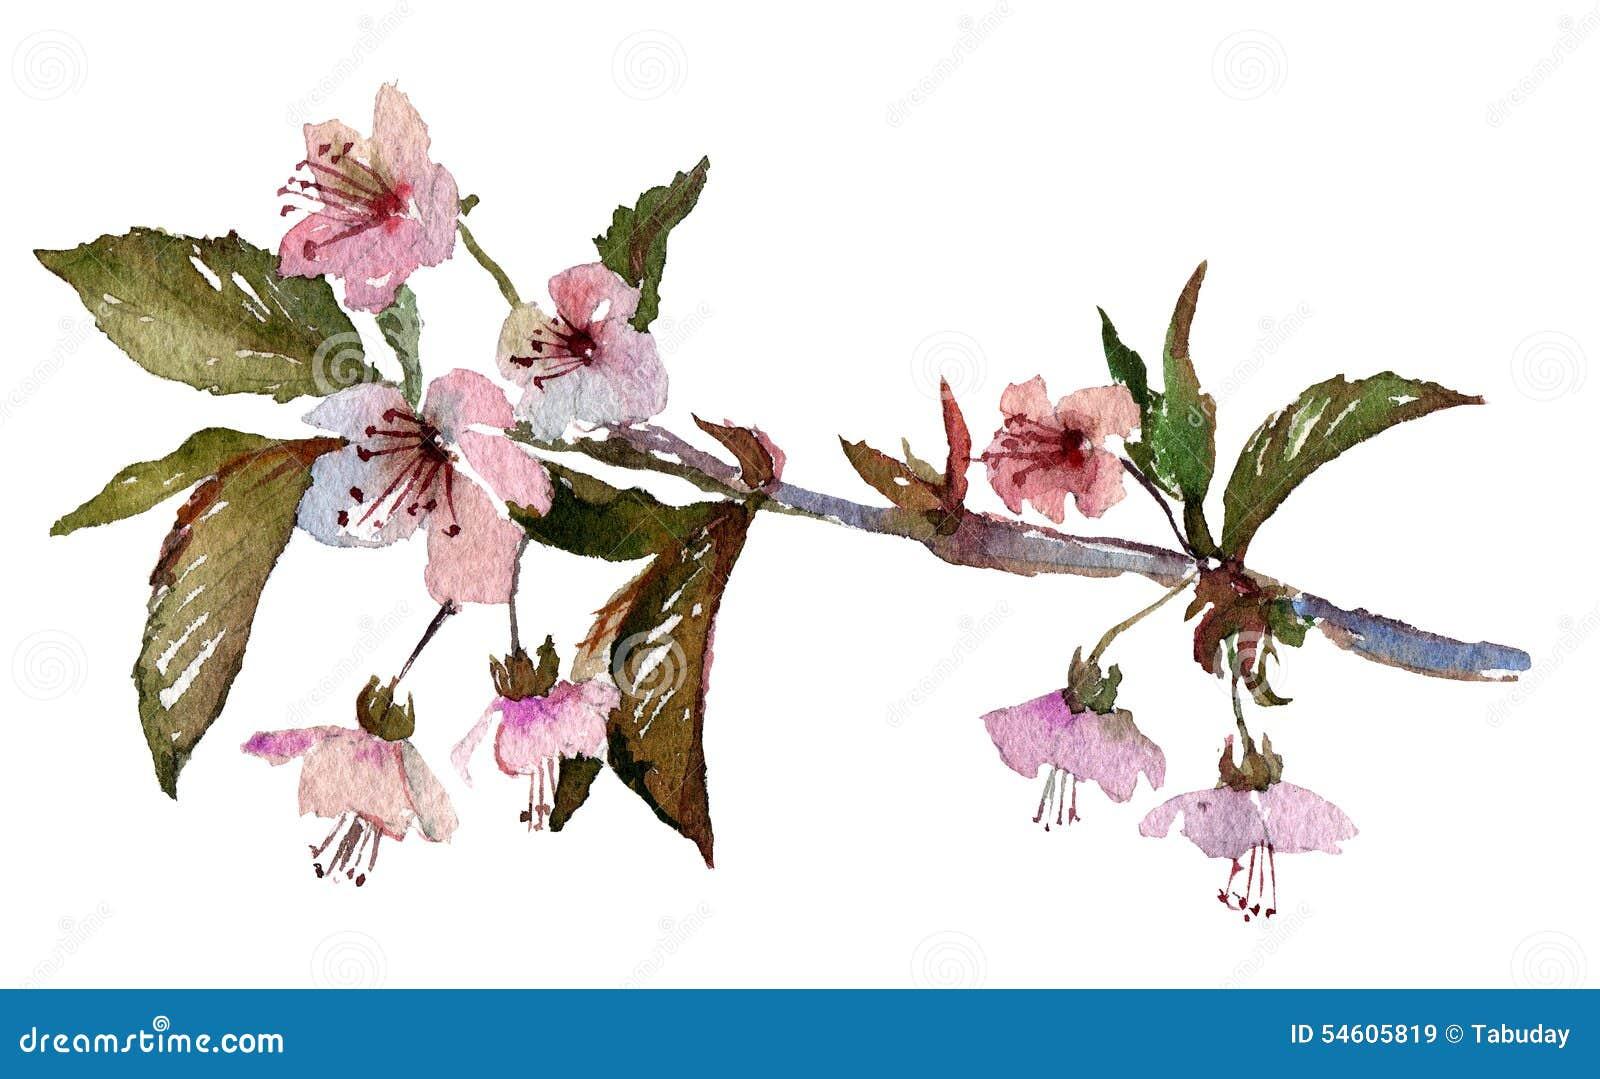 Sakura Branch Cherry Blossom With Pink Flowers Stock